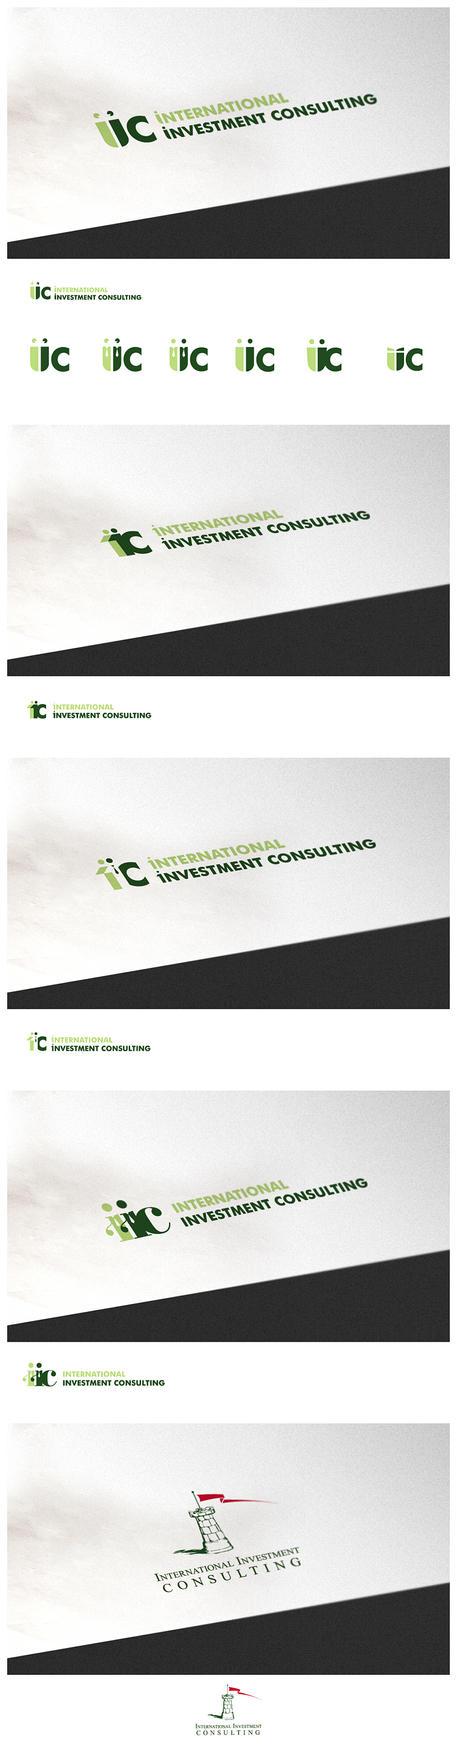 IIC Logo by pho3nix-bf